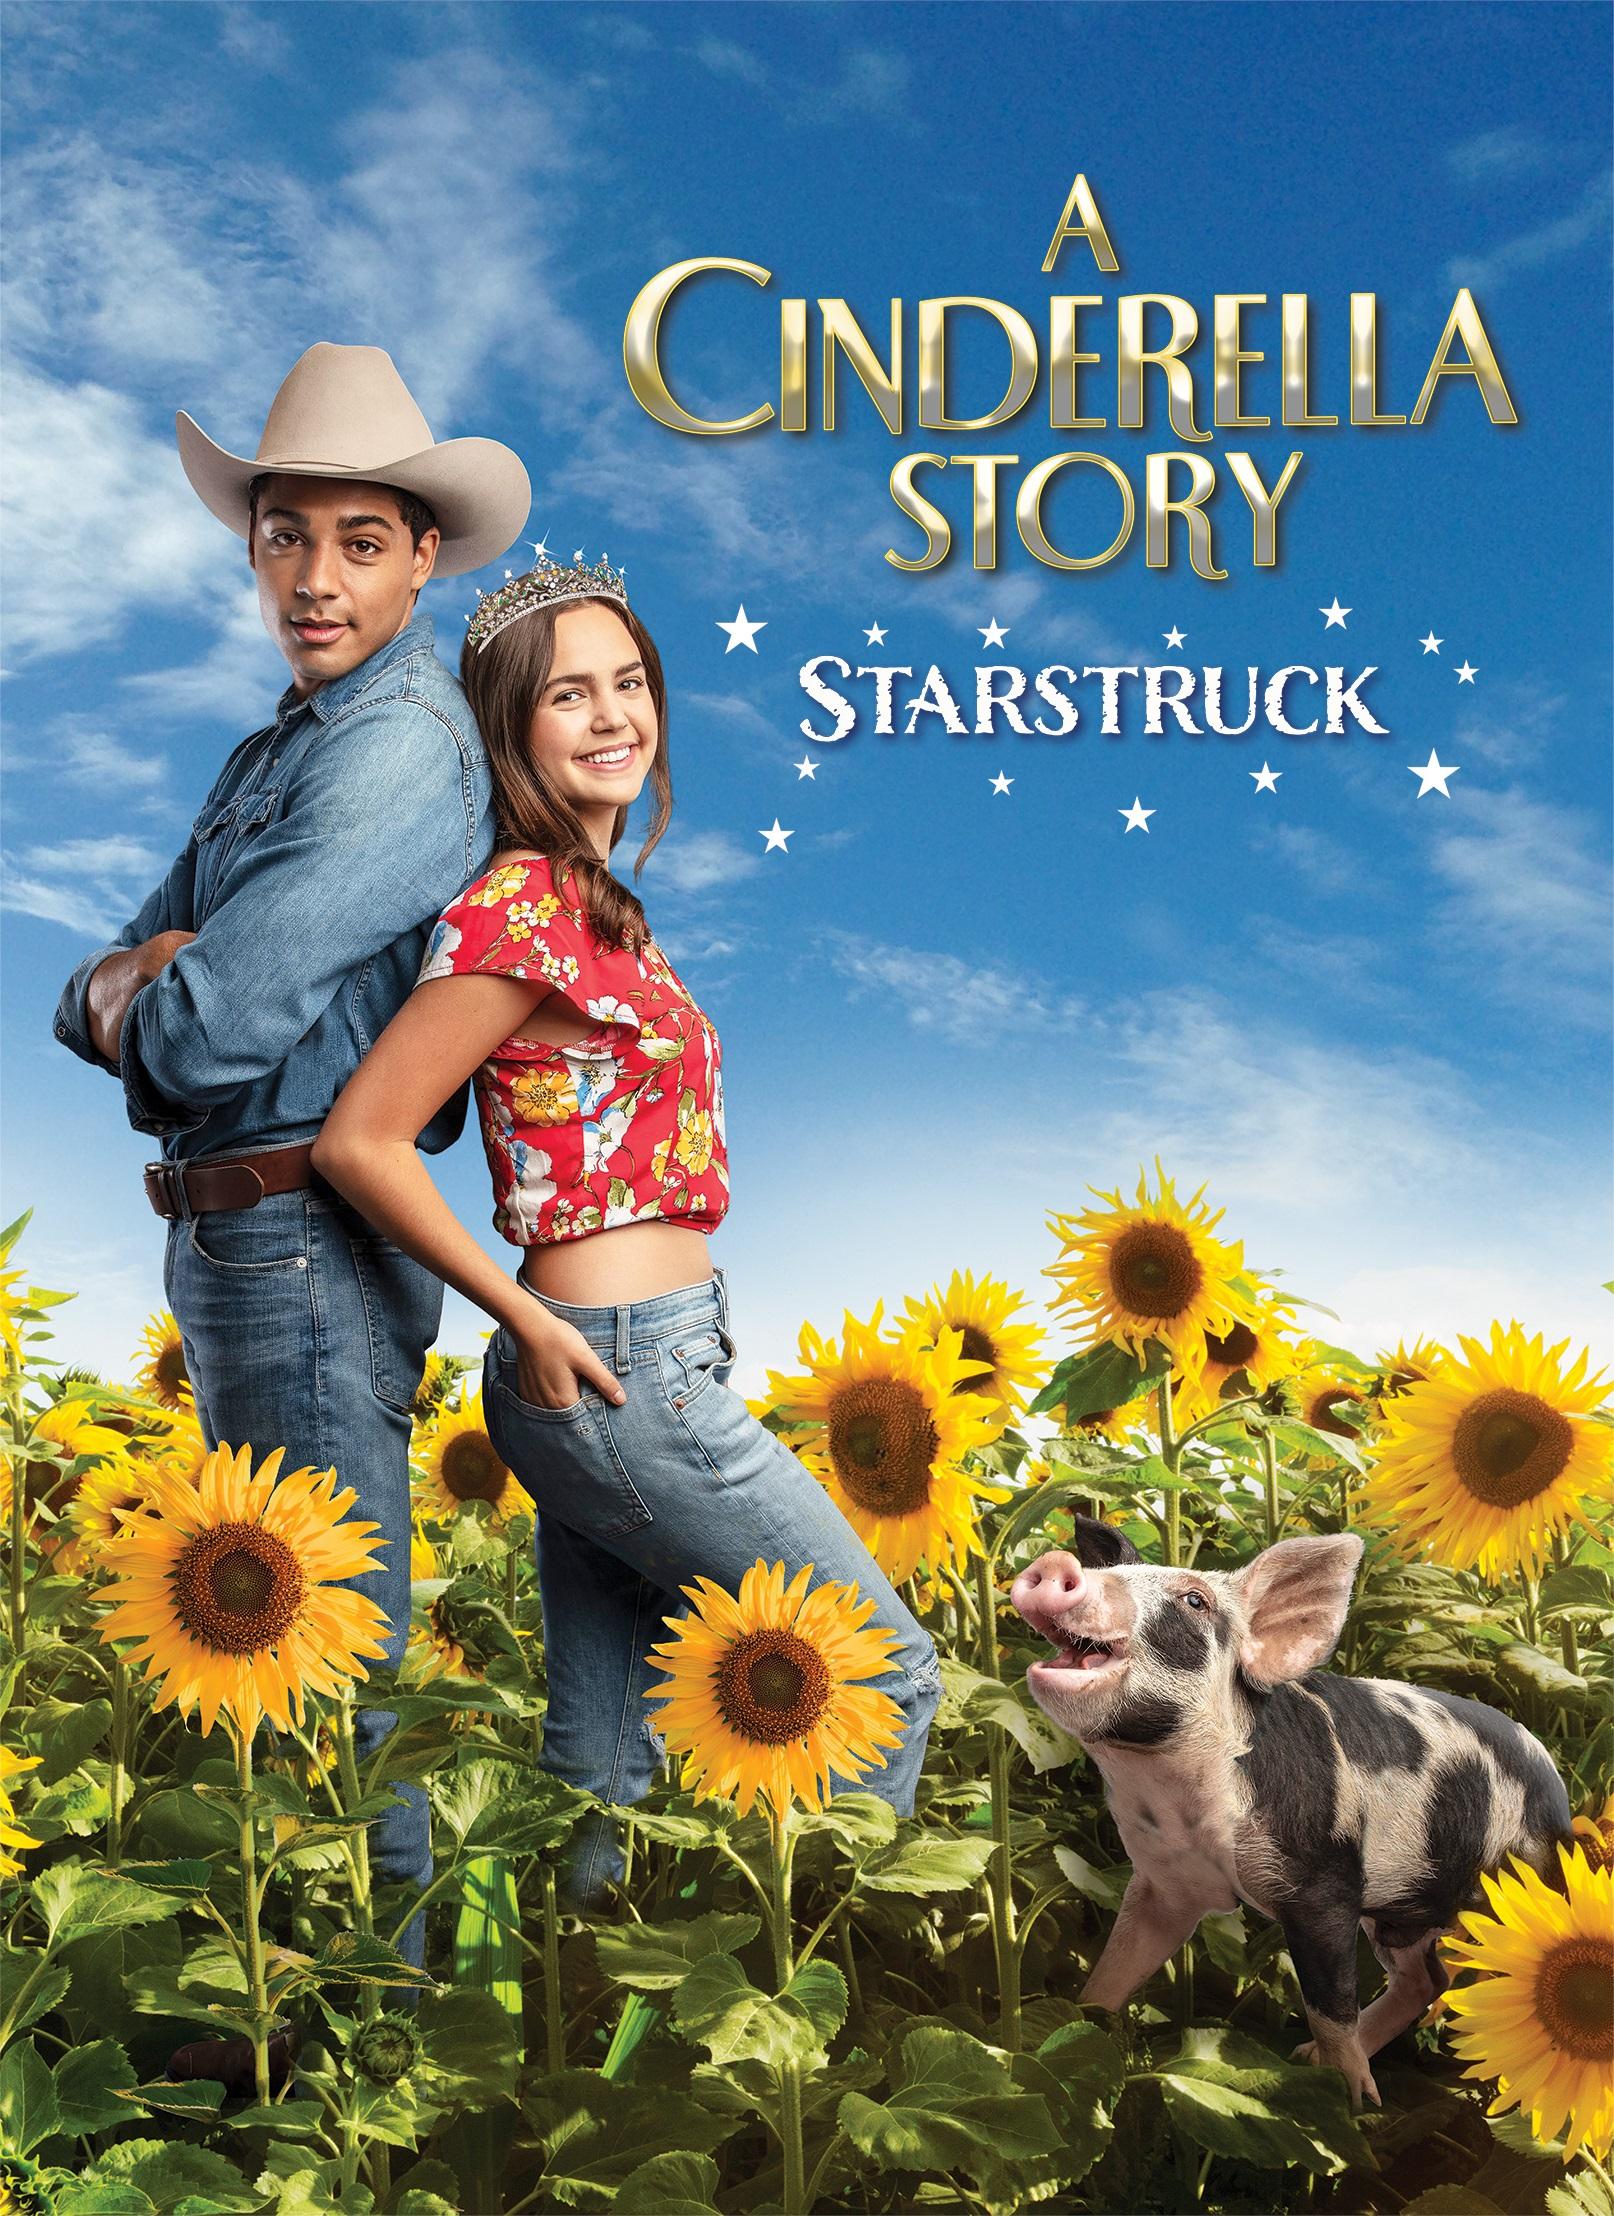 watch A Cinderella Story: Starstruck on soap2day